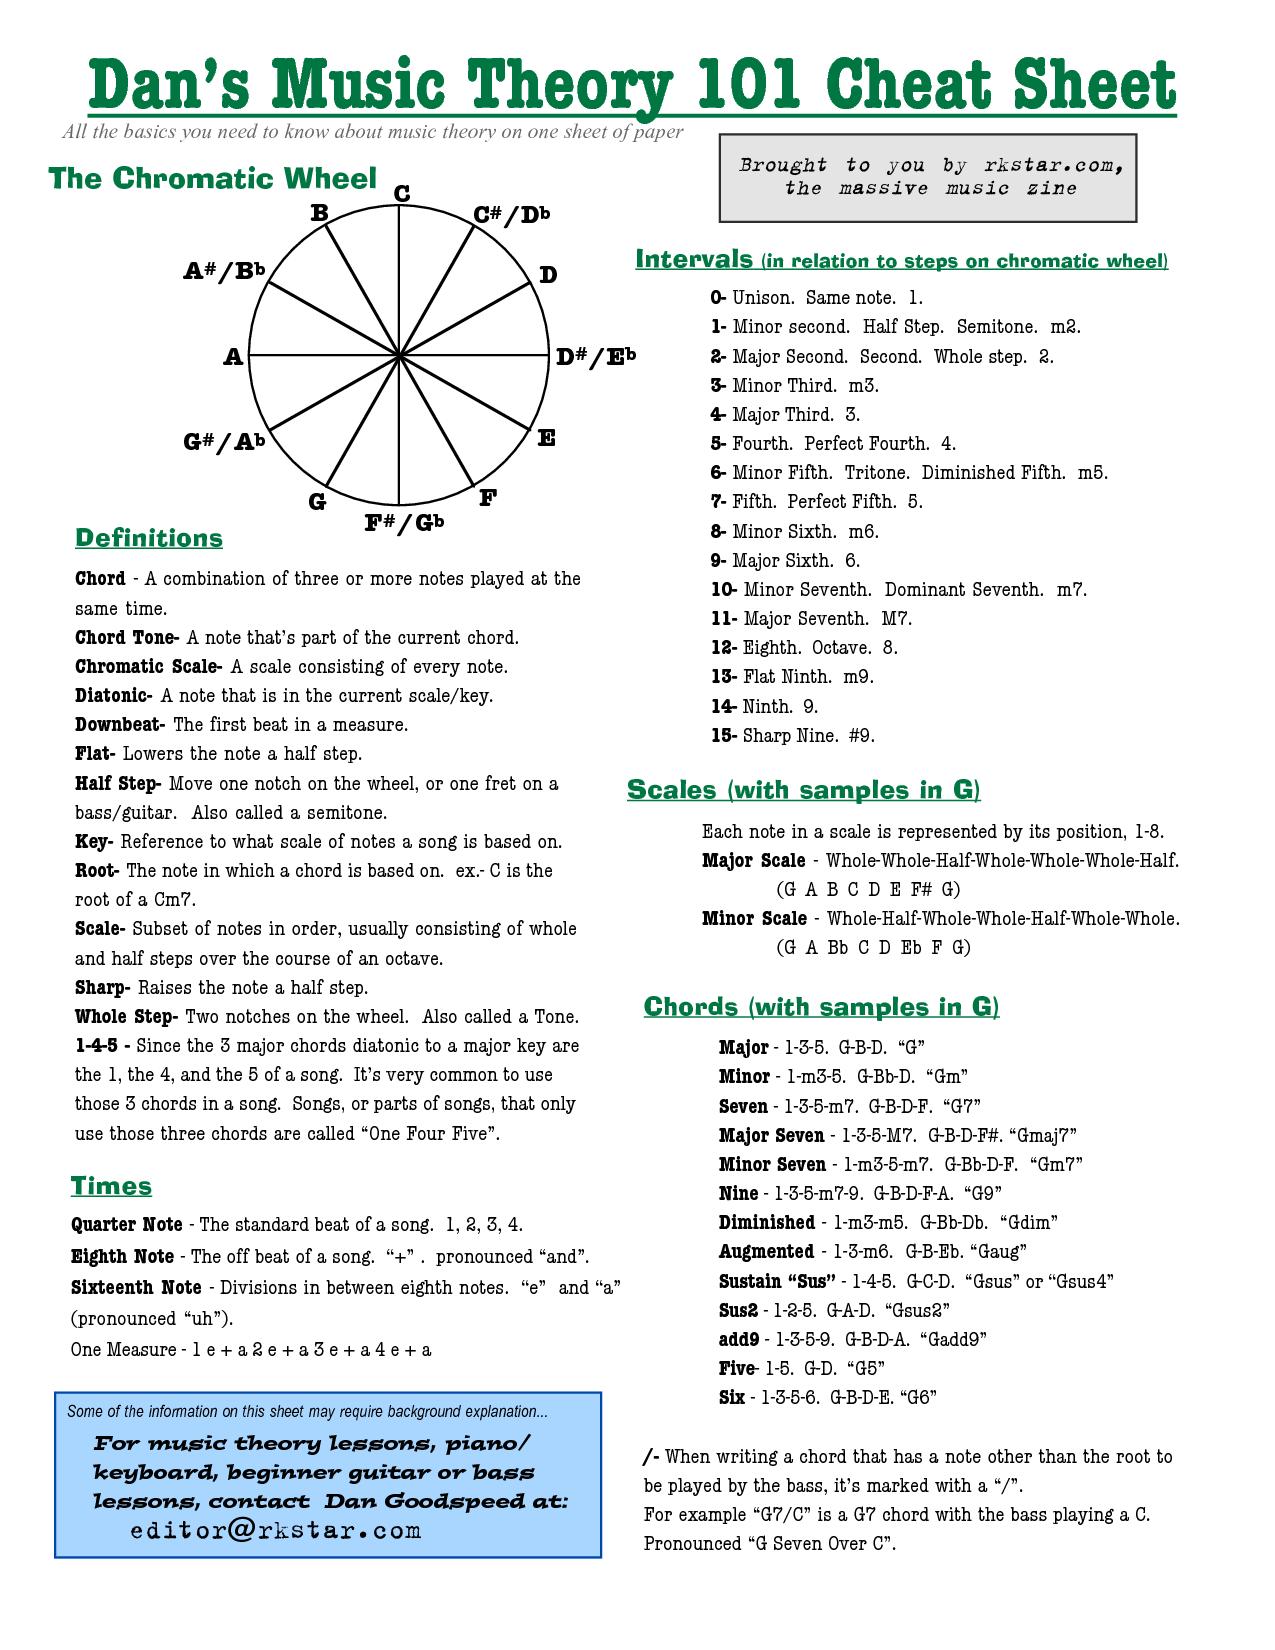 Music Theory 101 Cheat Sheet. Guitar Pinterest Music